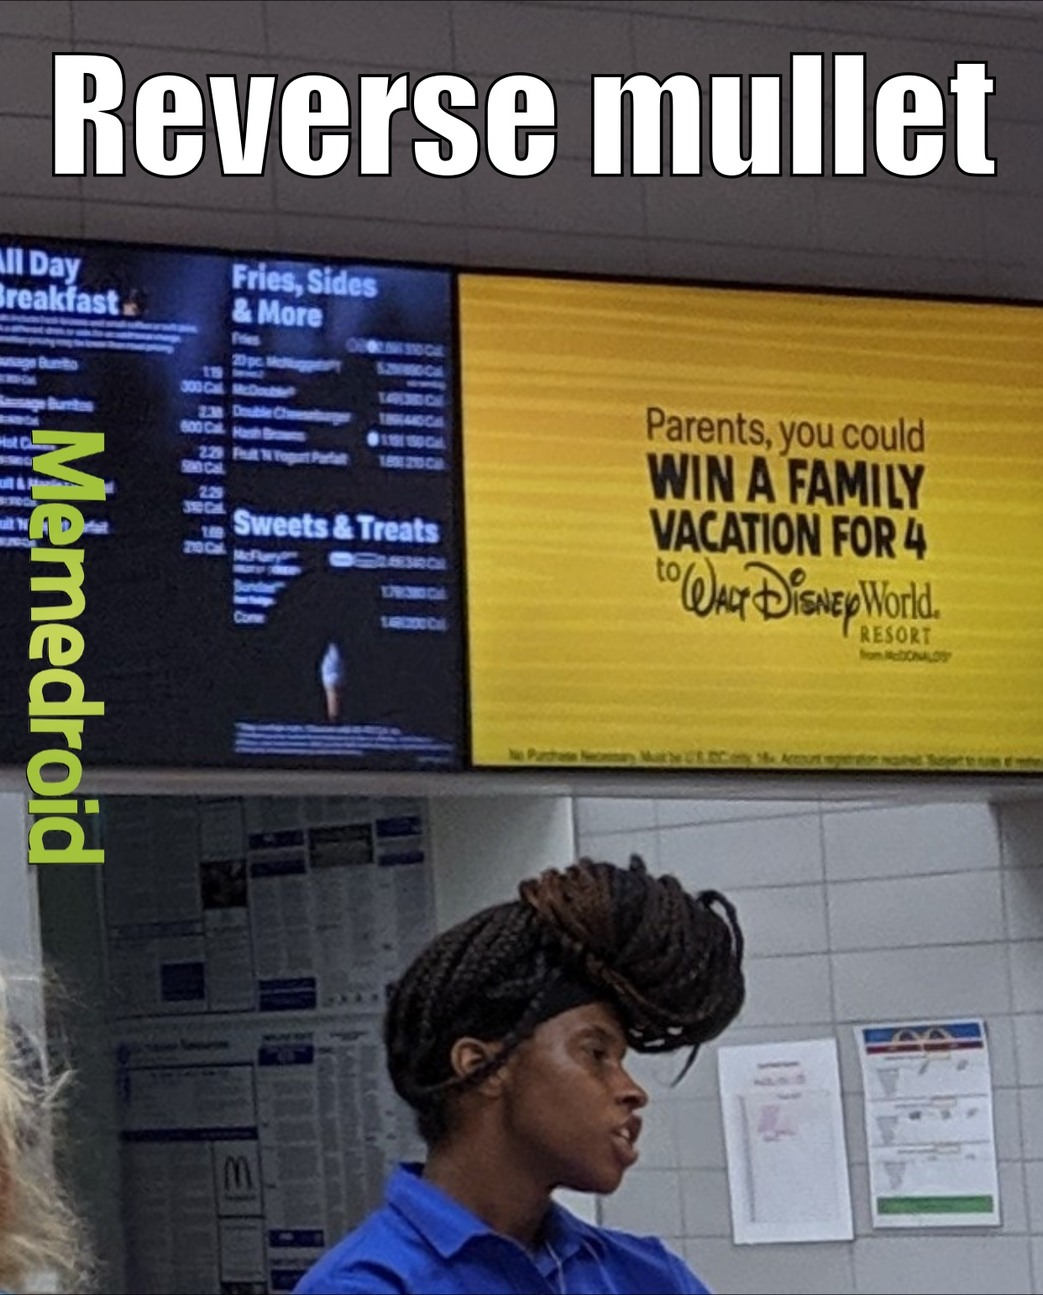 Reverse Mullet - meme